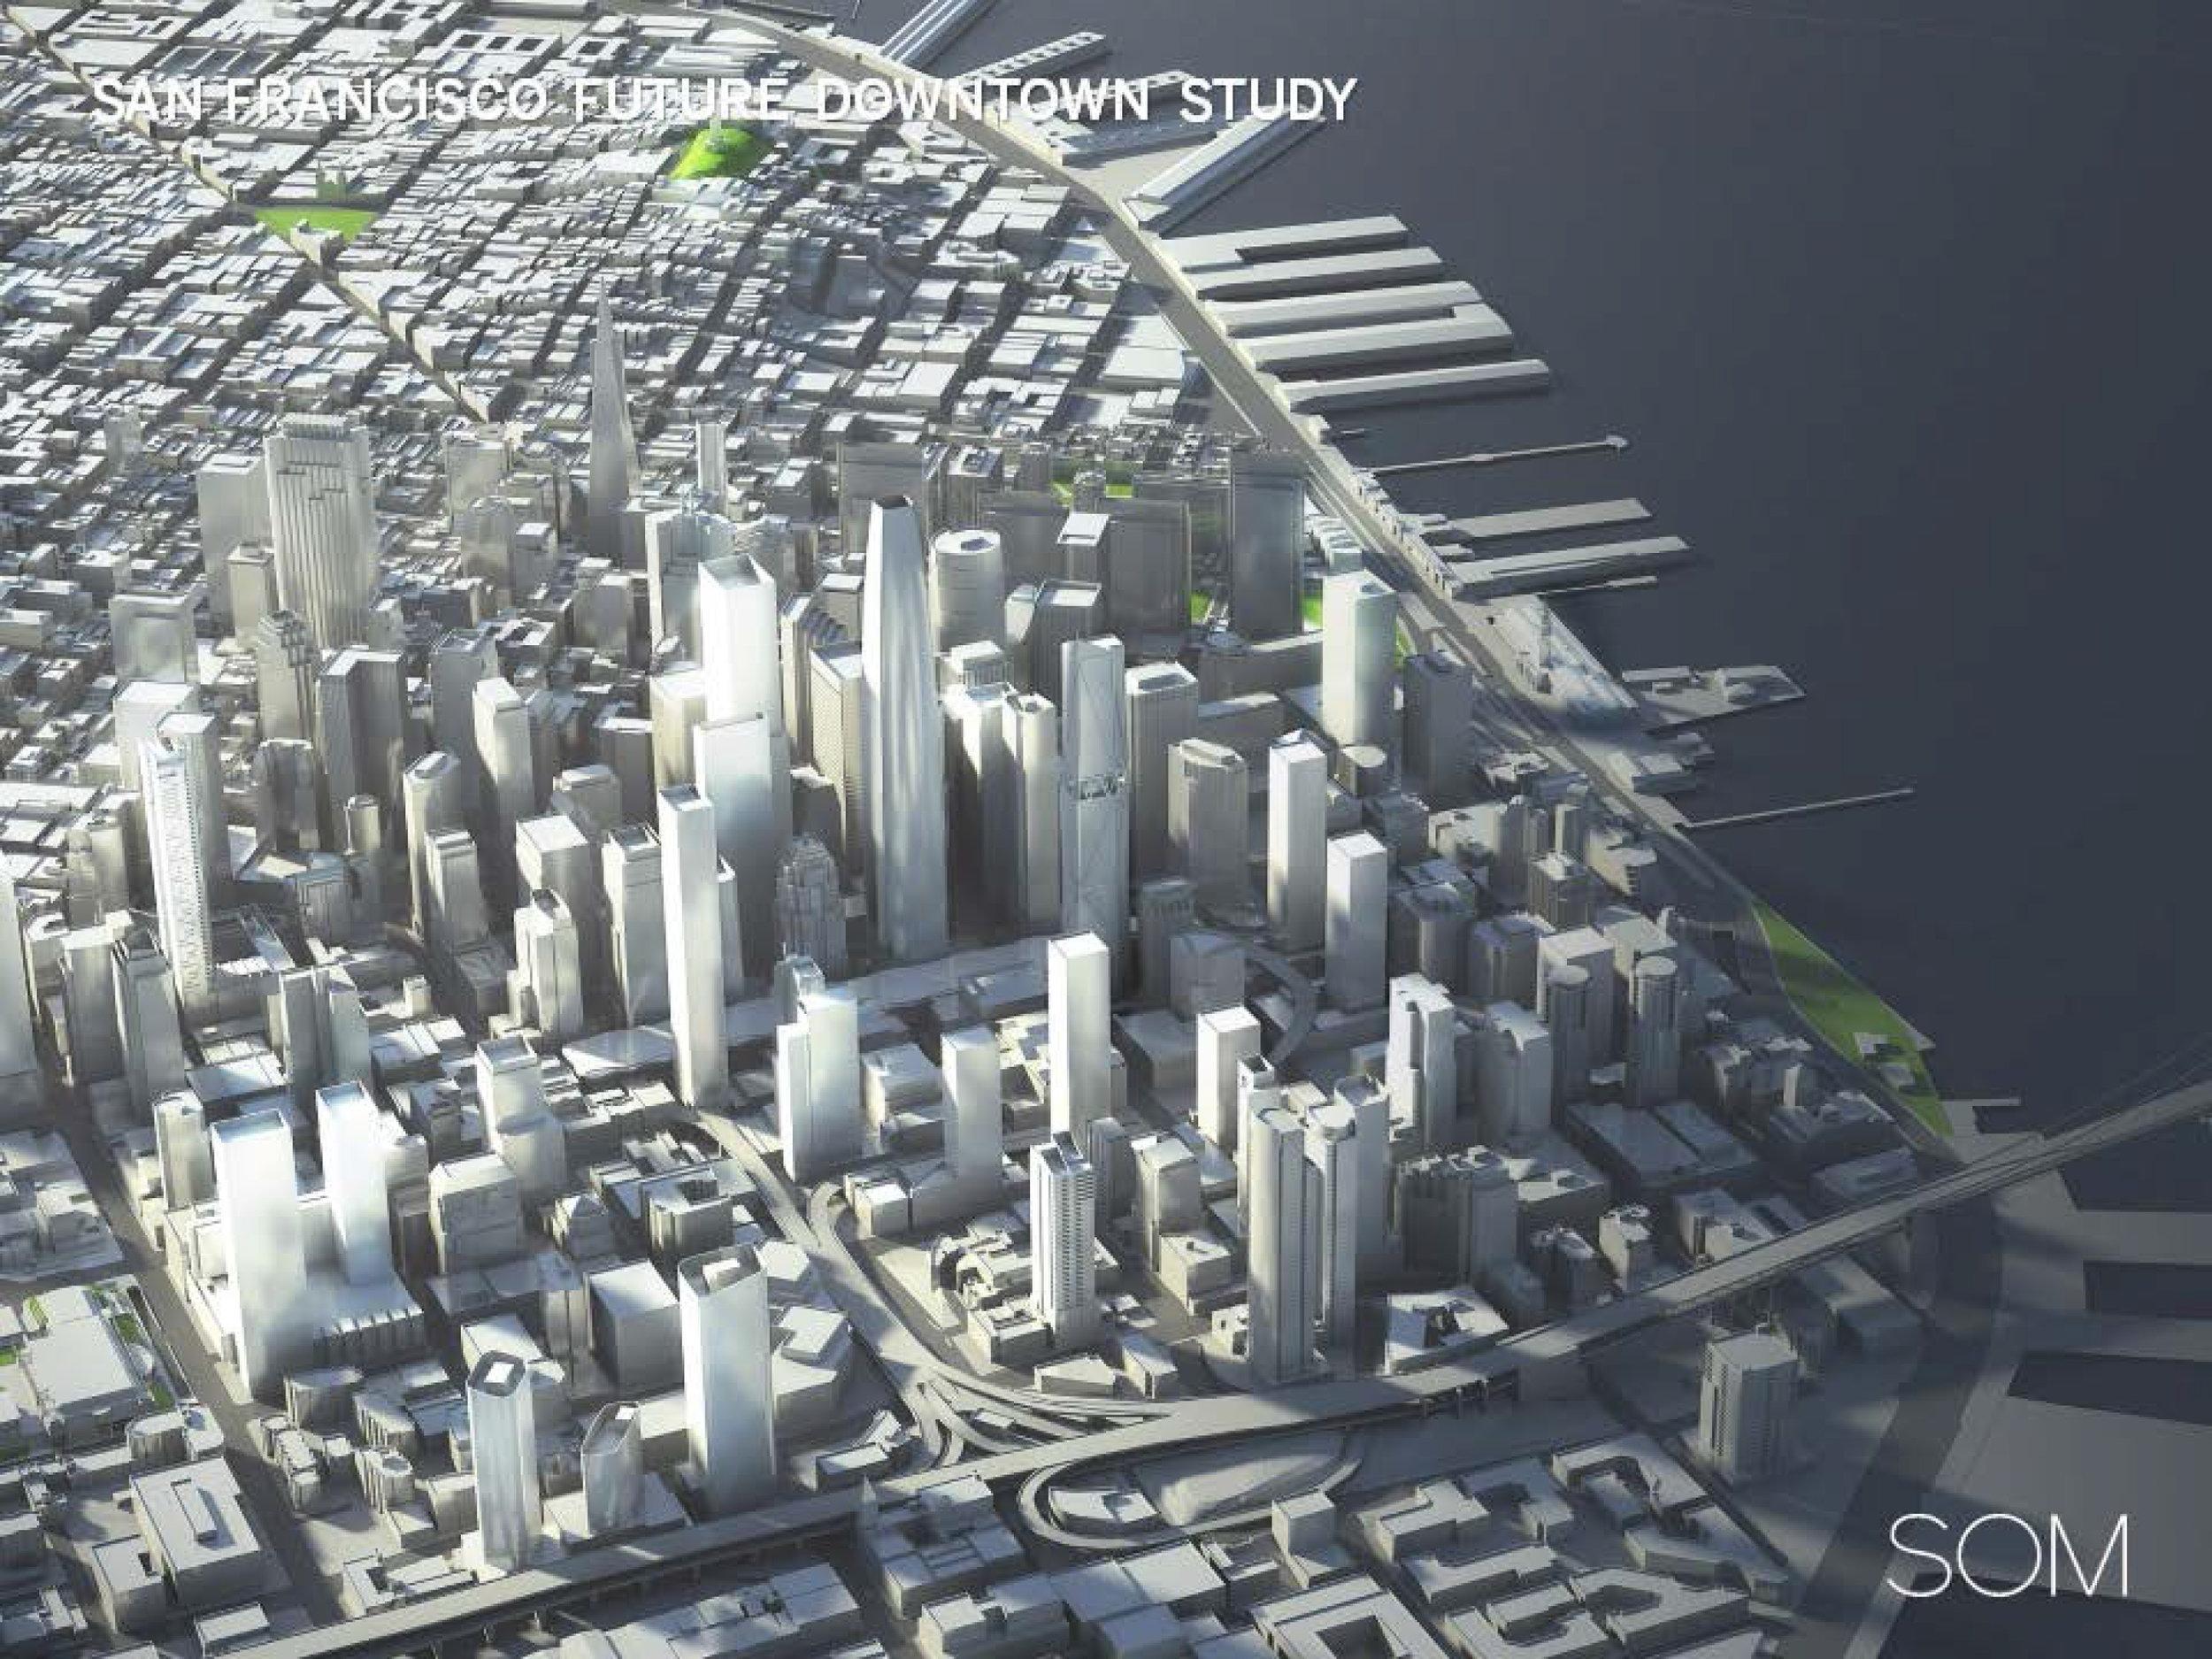 MIT ARCHITECTURE 150 SAN FRANCISCO SLIDESHOW-97 copy.jpg